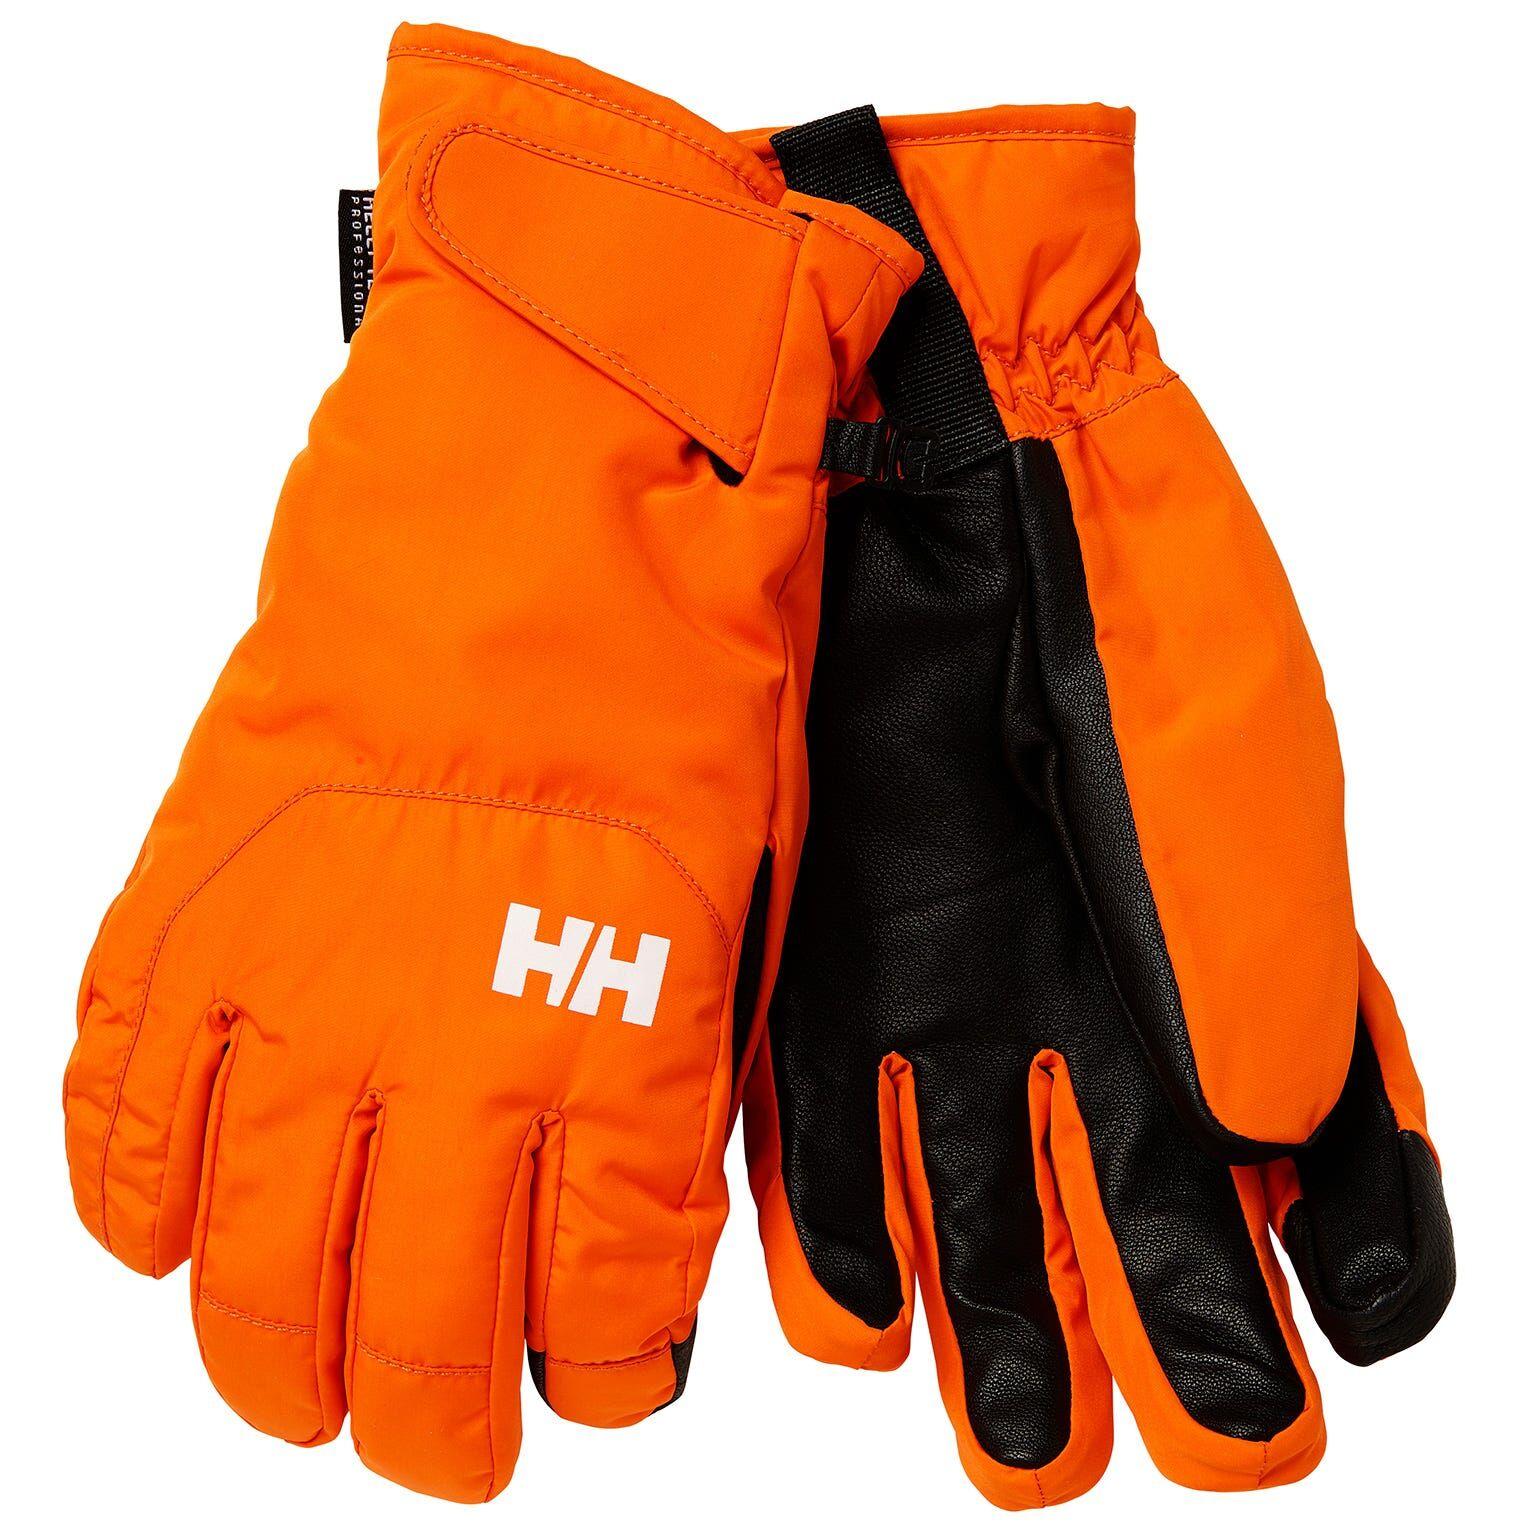 Helly Hansen Swift Ht Glove Mens Yellow S